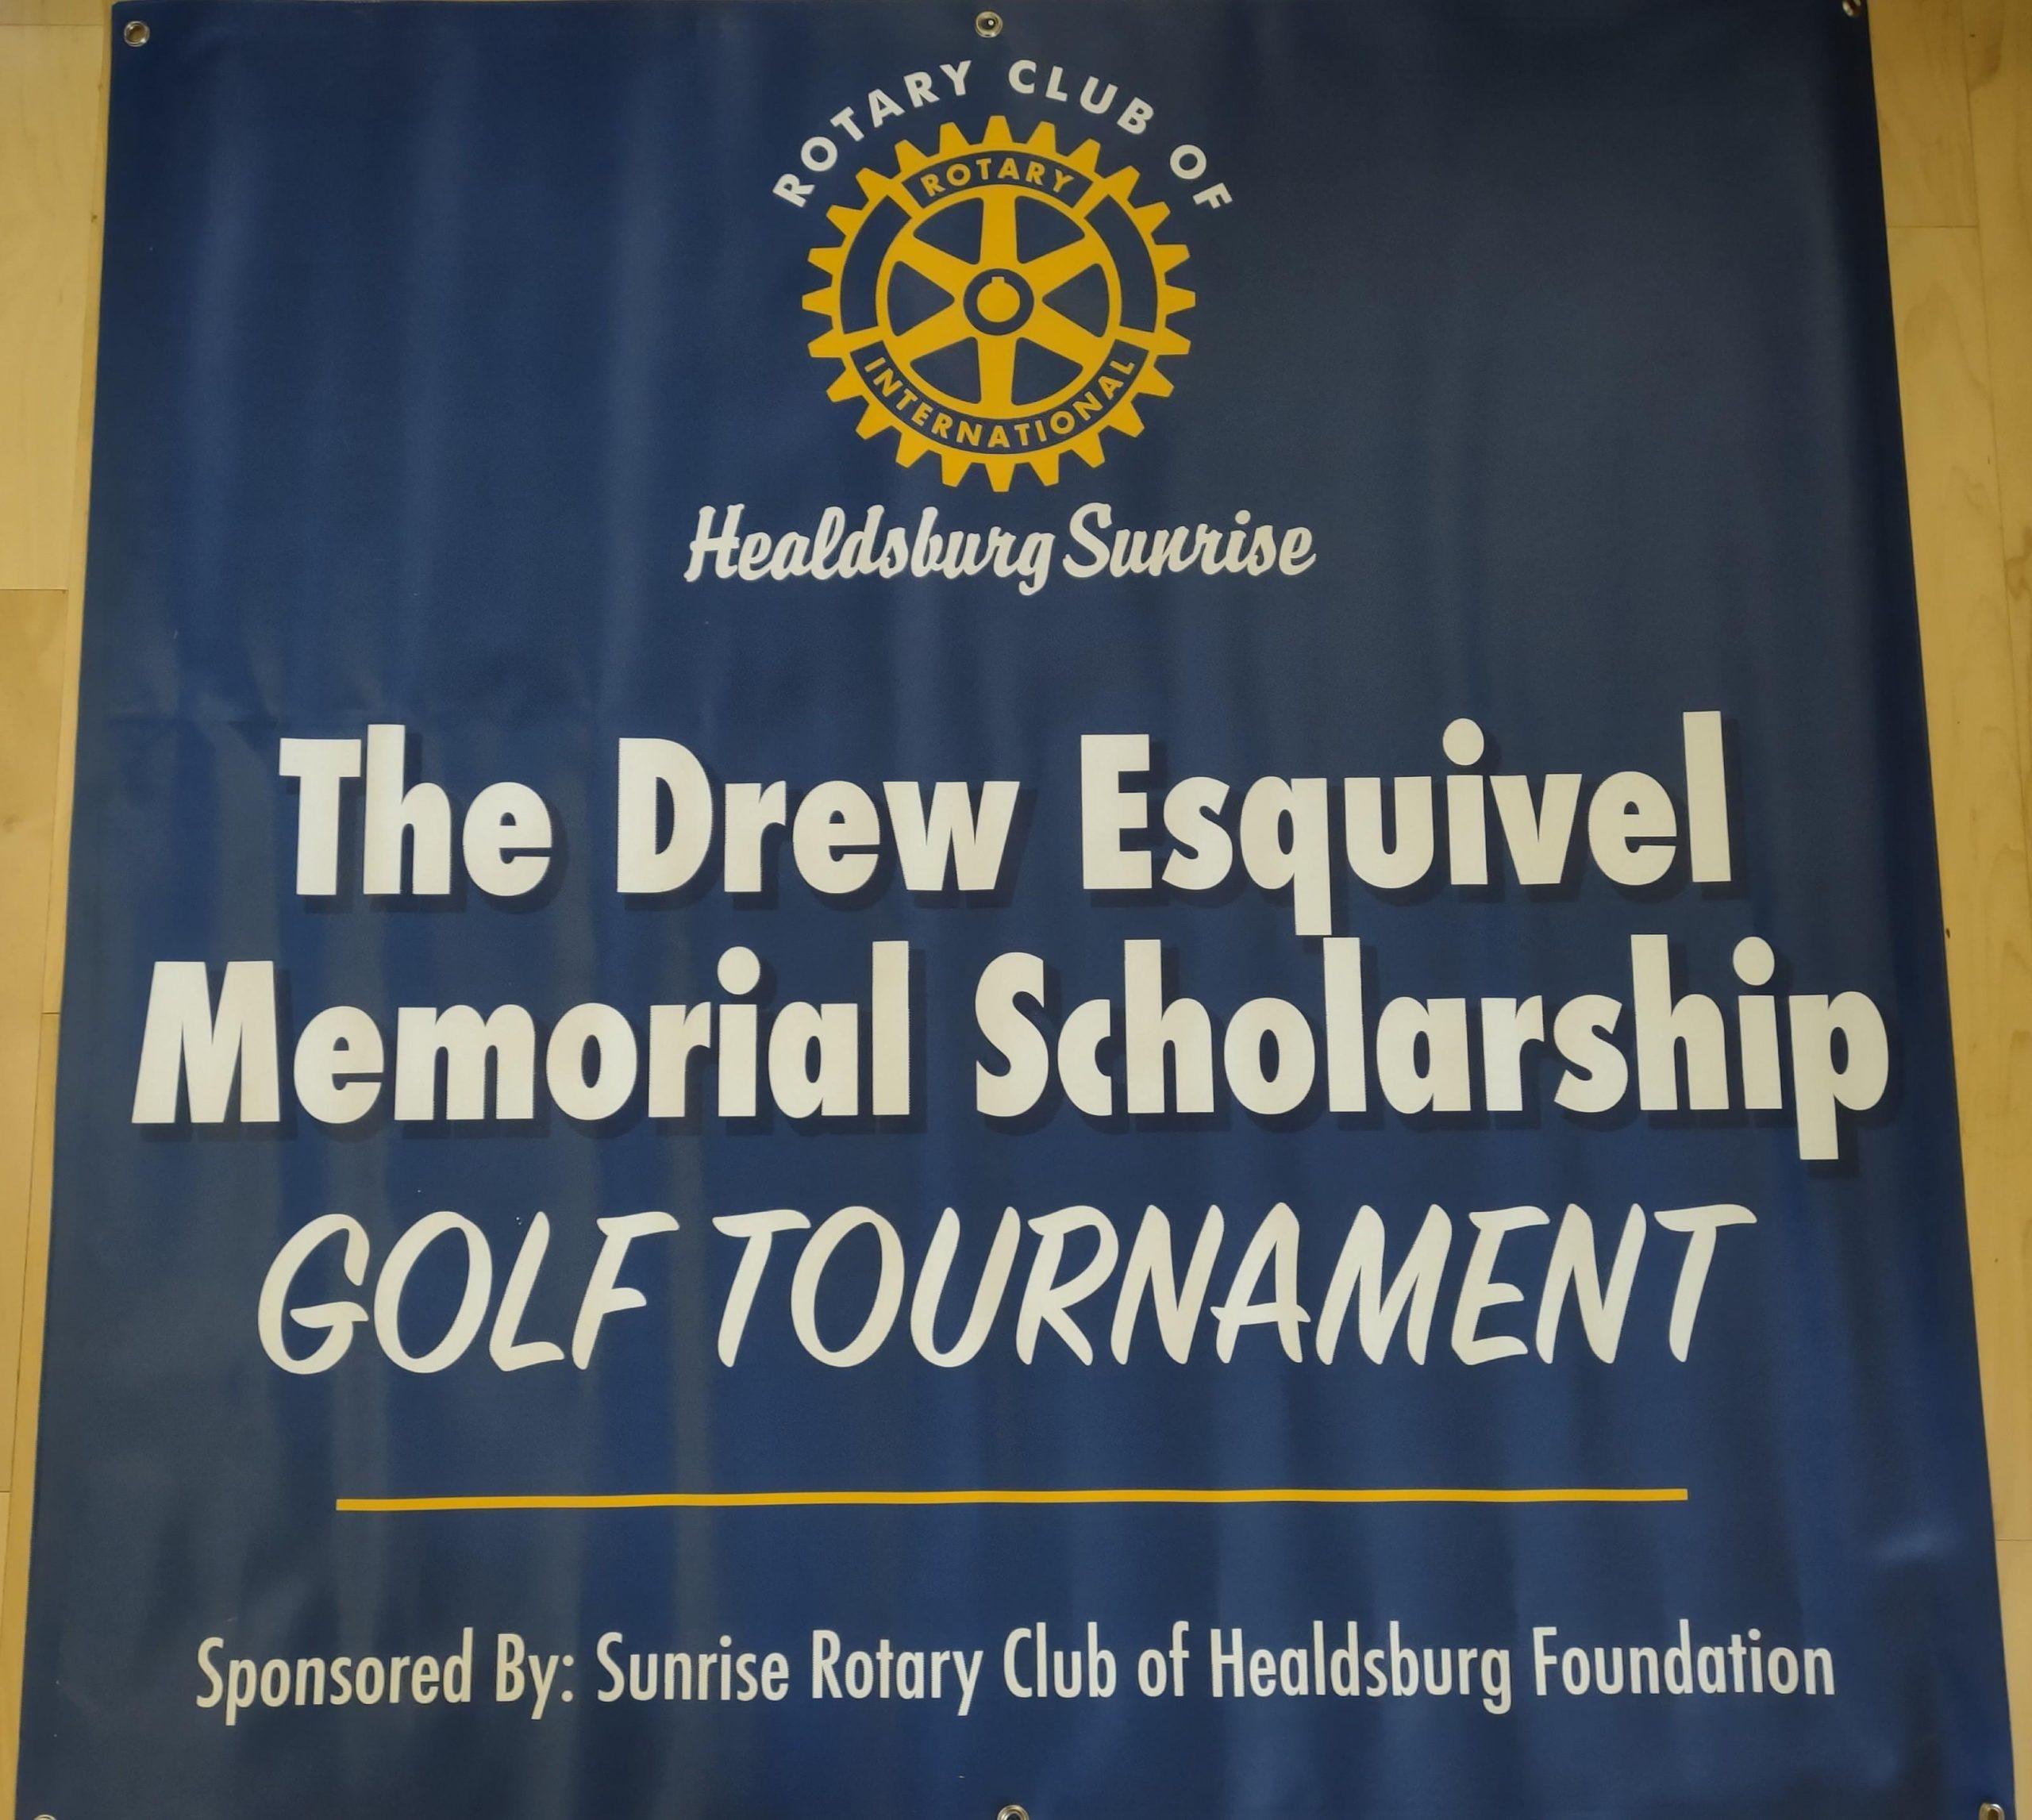 Drew Esquivel Memorial Scholarship Golf Tournament